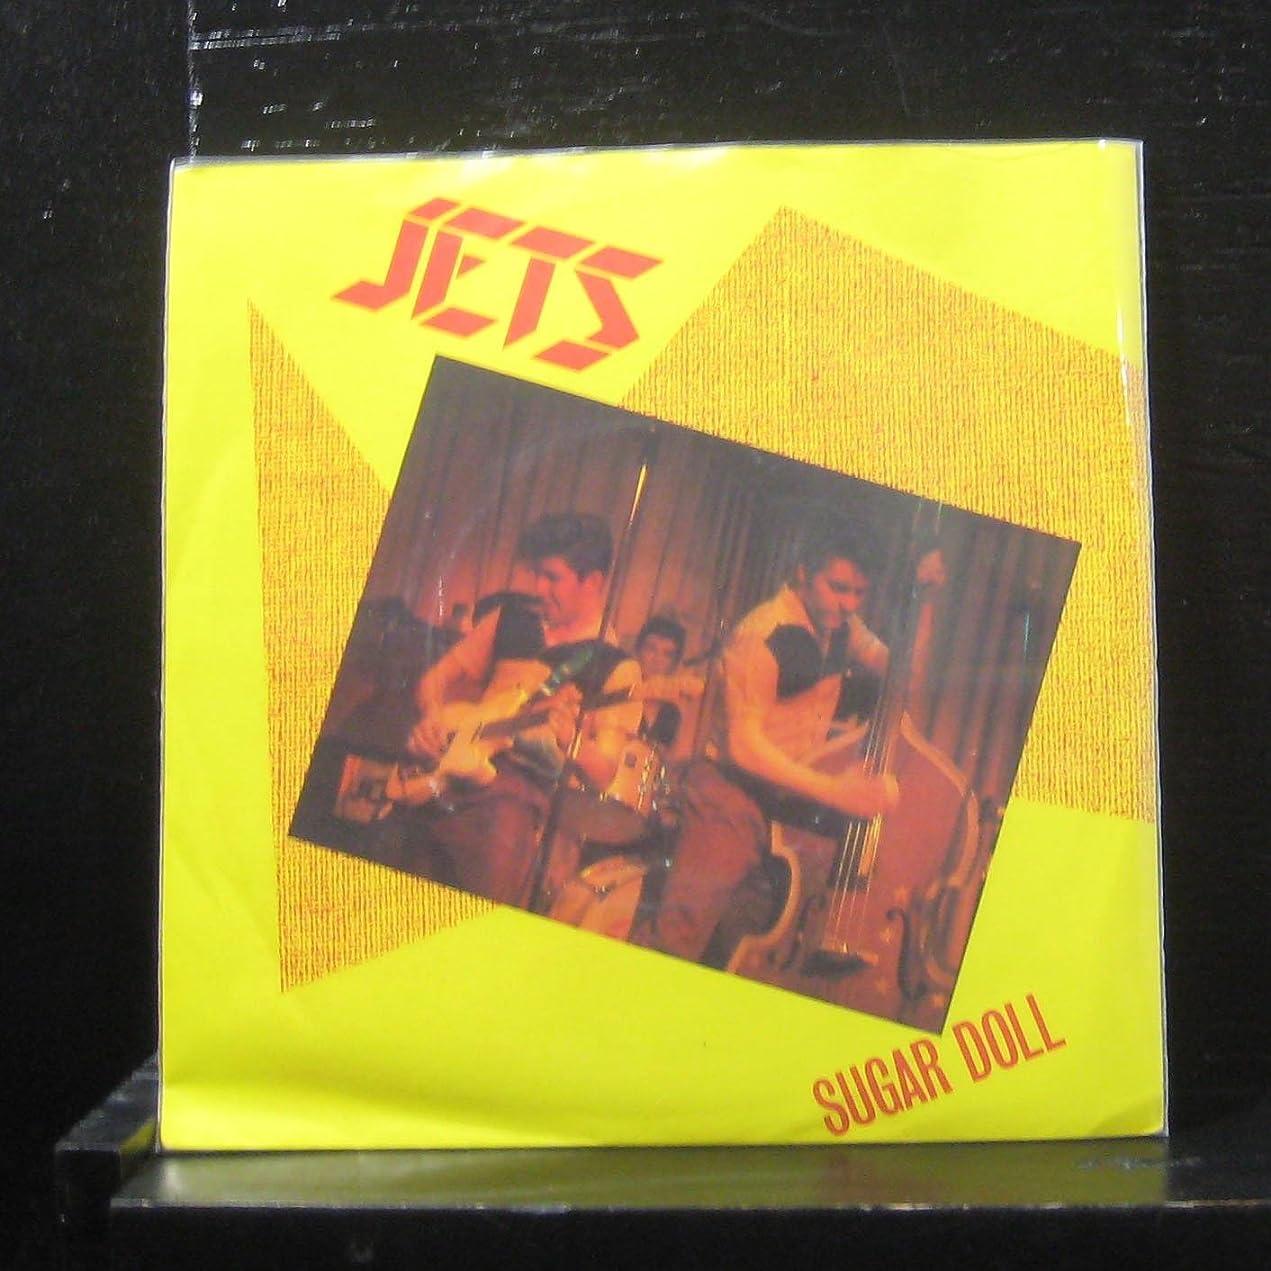 Sugar Doll - Jets 7